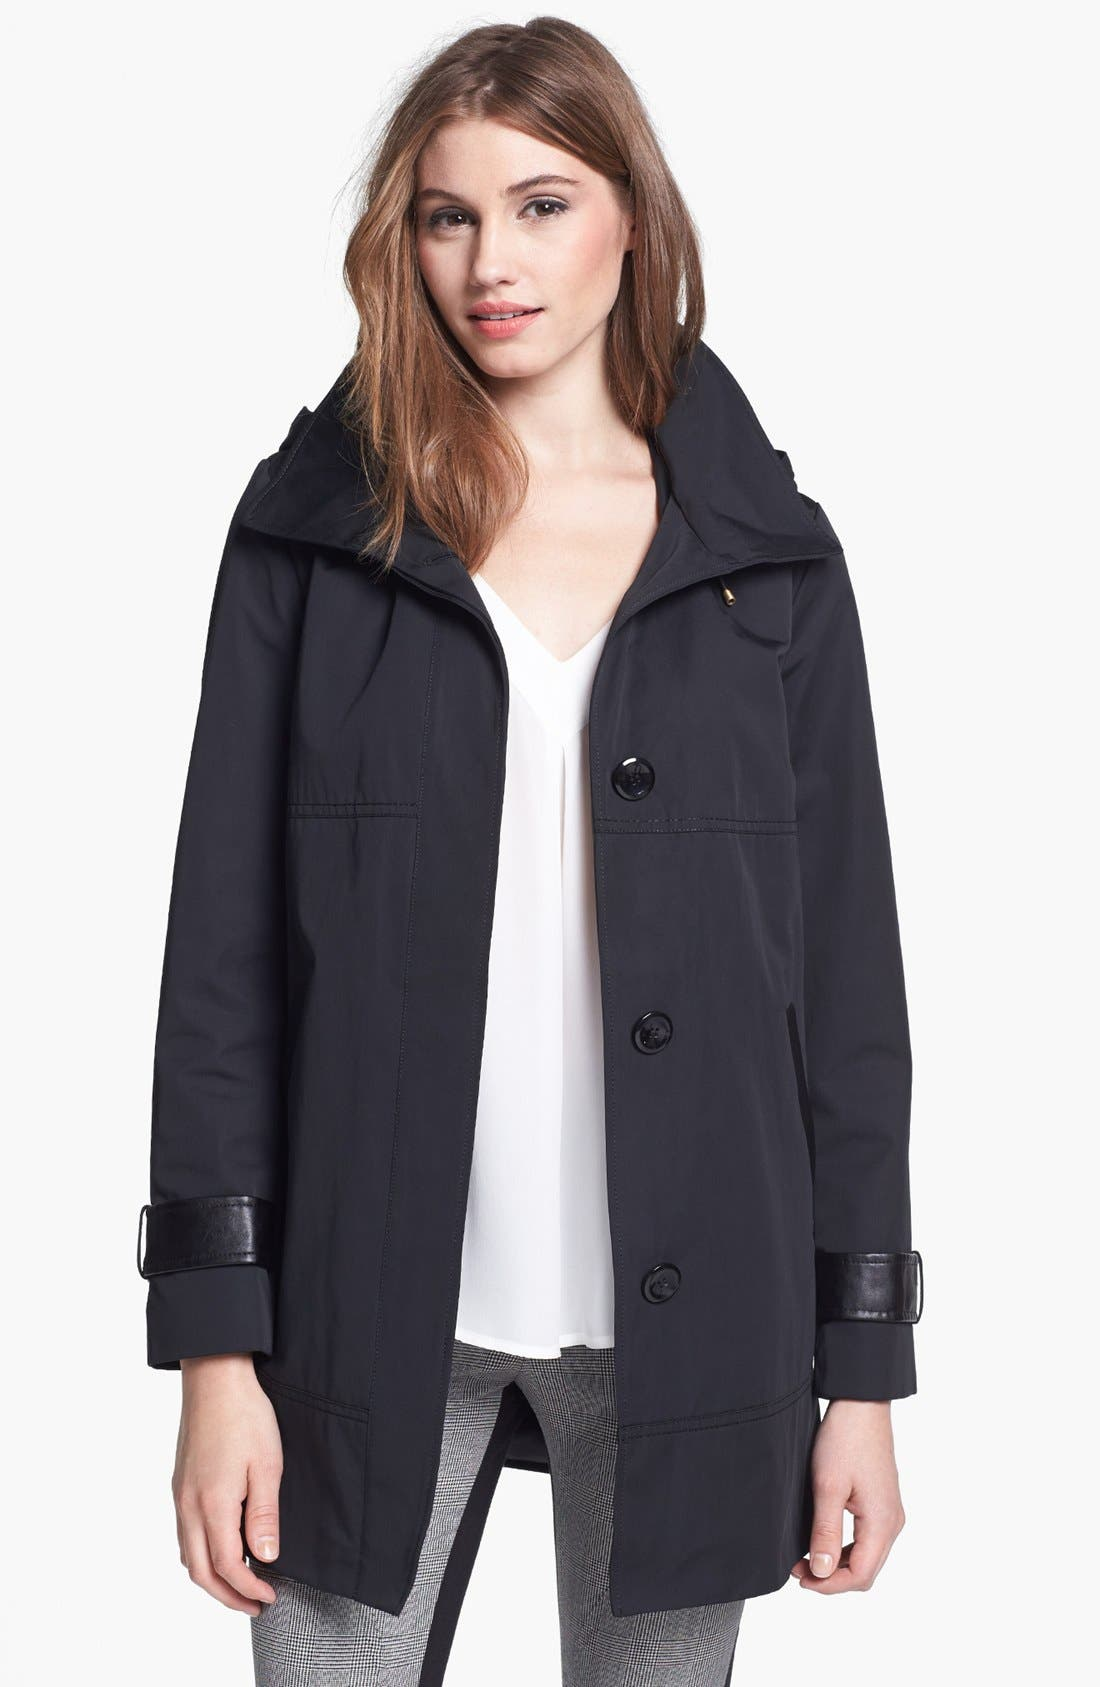 Alternate Image 1 Selected - Ellen Tracy Faux Leather Trim Raincoat (Regular & Petite)